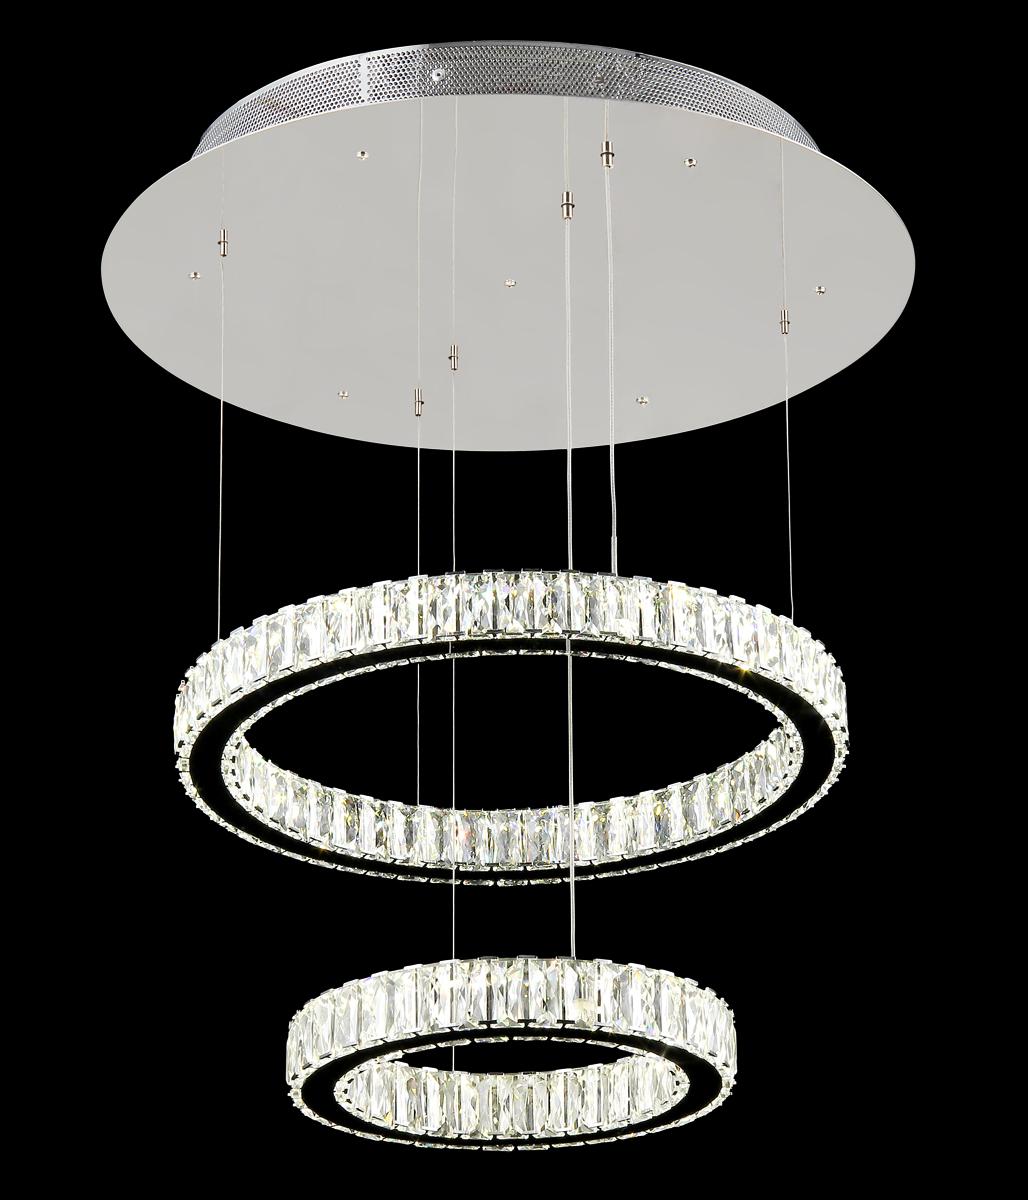 Люстра Natali Kovaltseva 11271/2A CHROME, LED11271/2A CHROME, LEDD50 x H35 cm